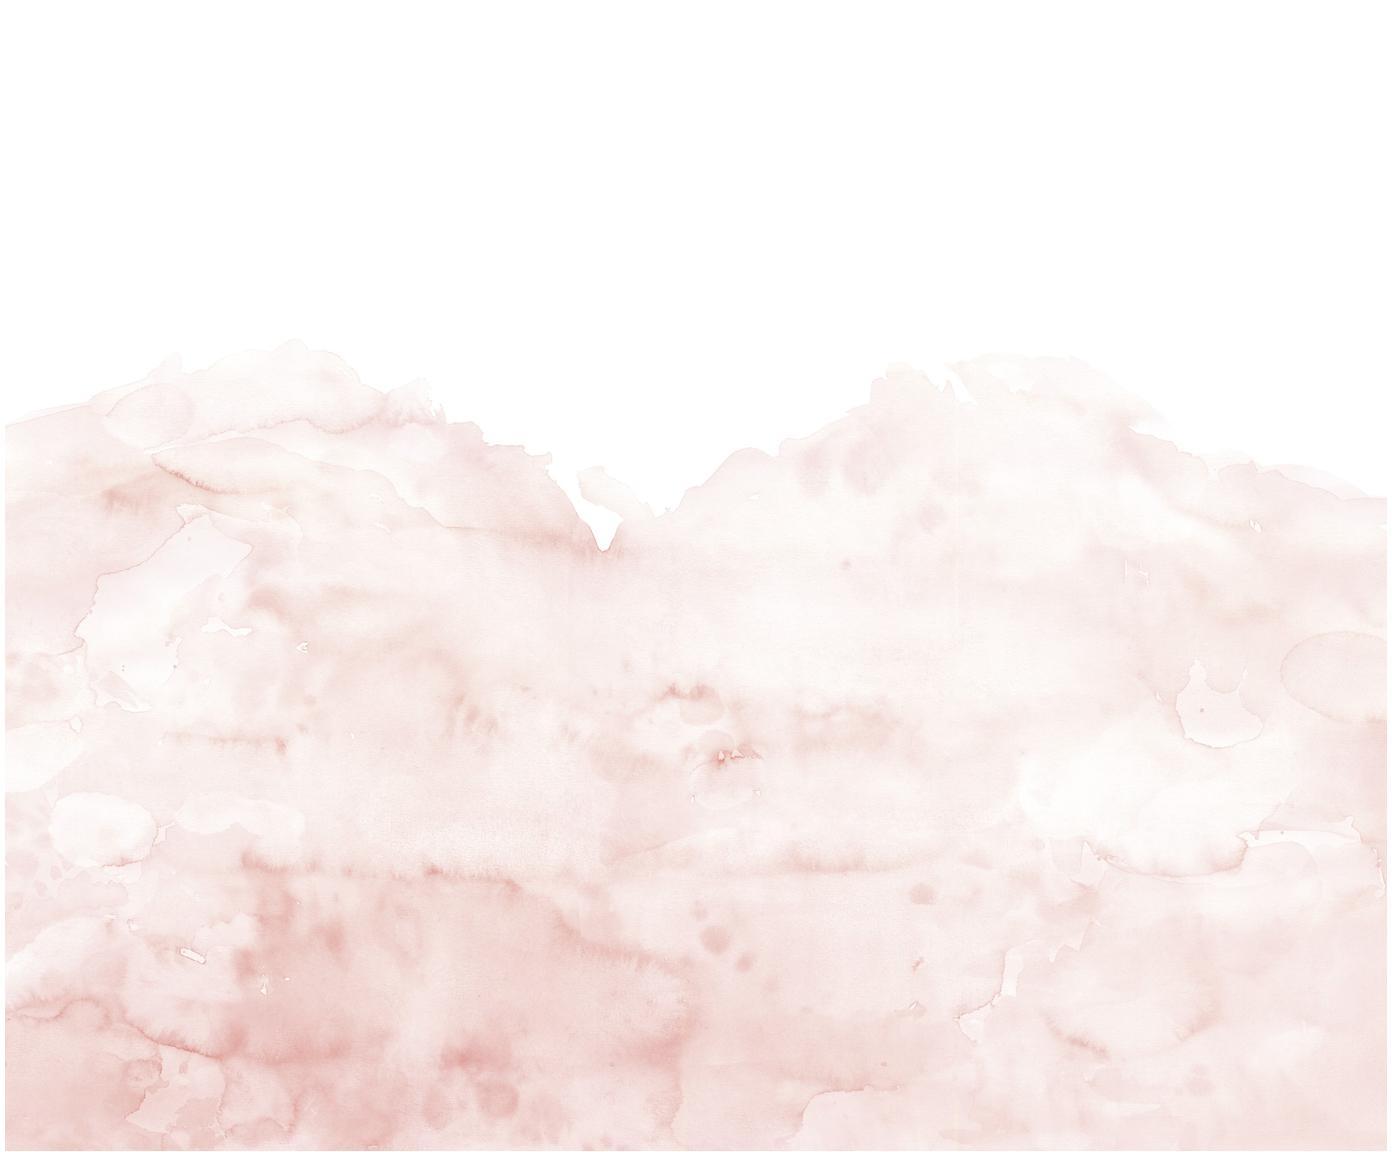 Carta da parati Pink Clouds, Tessuto non tessuto, Rosa, bianco, Larg. 372 x Lung. 280 cm